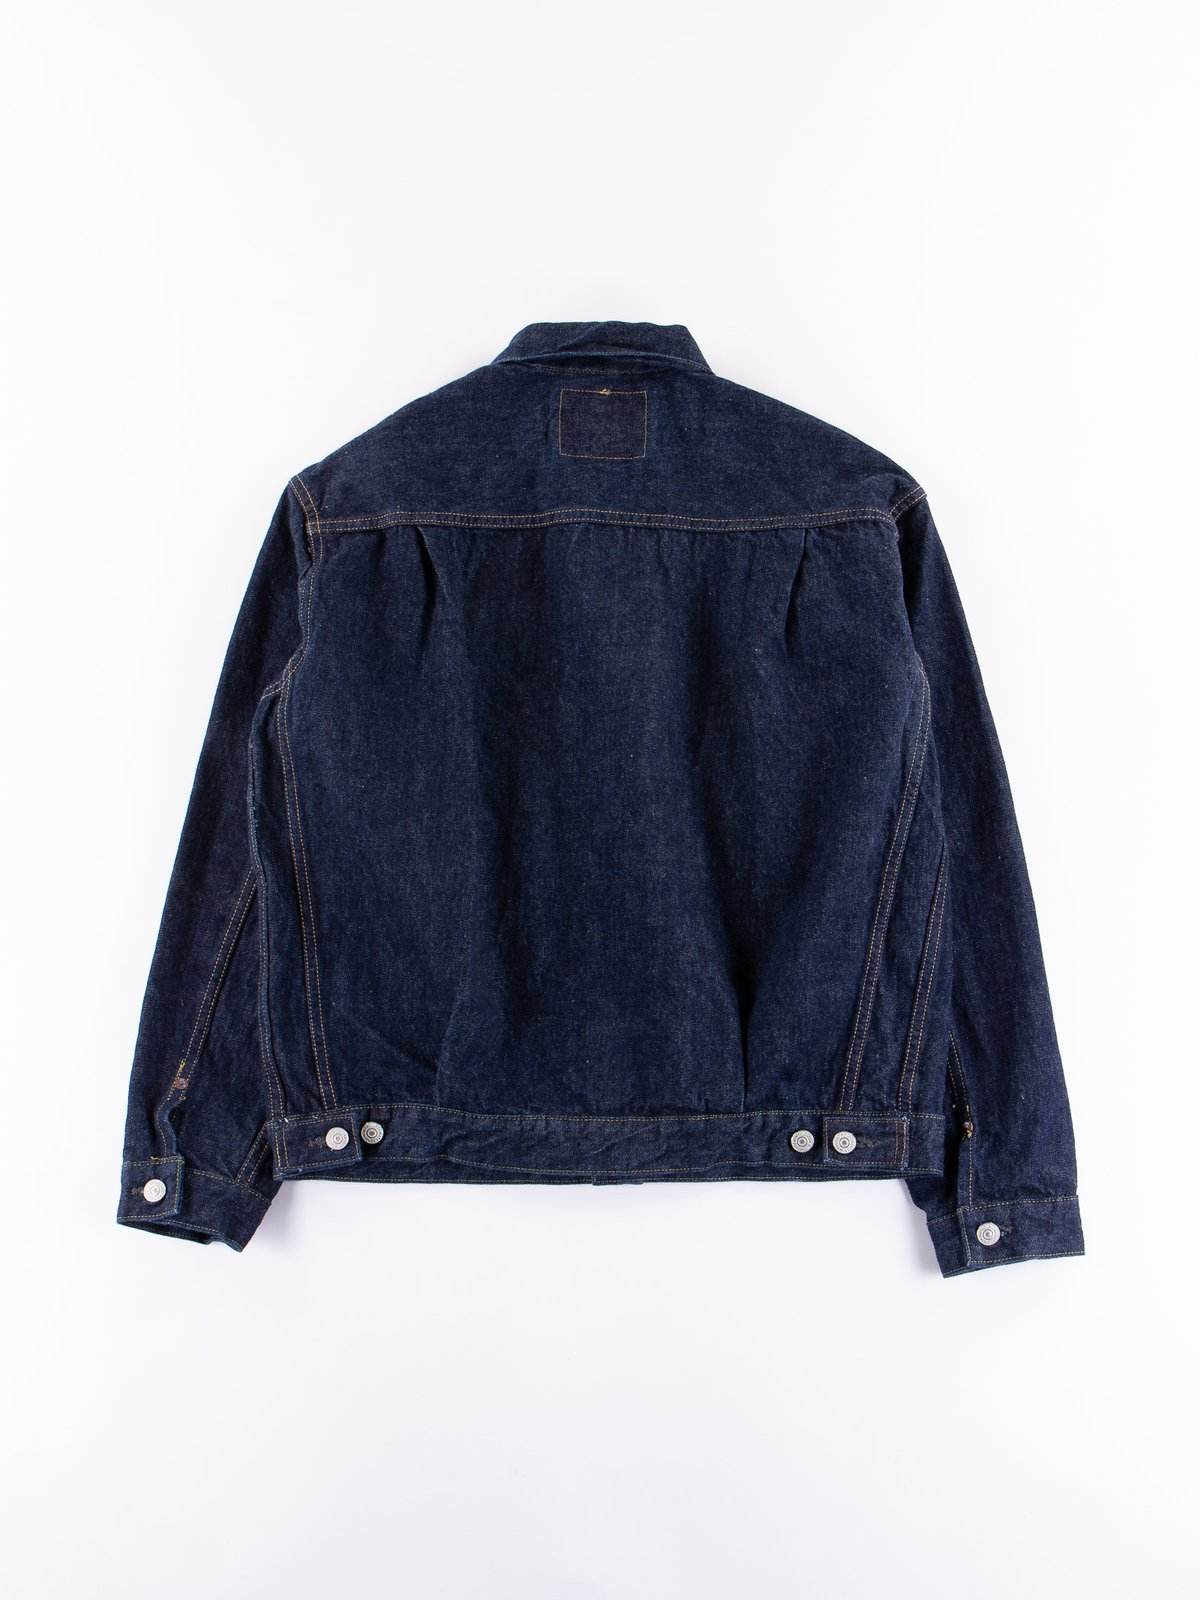 One Wash Type II Denim Jacket - Image 6